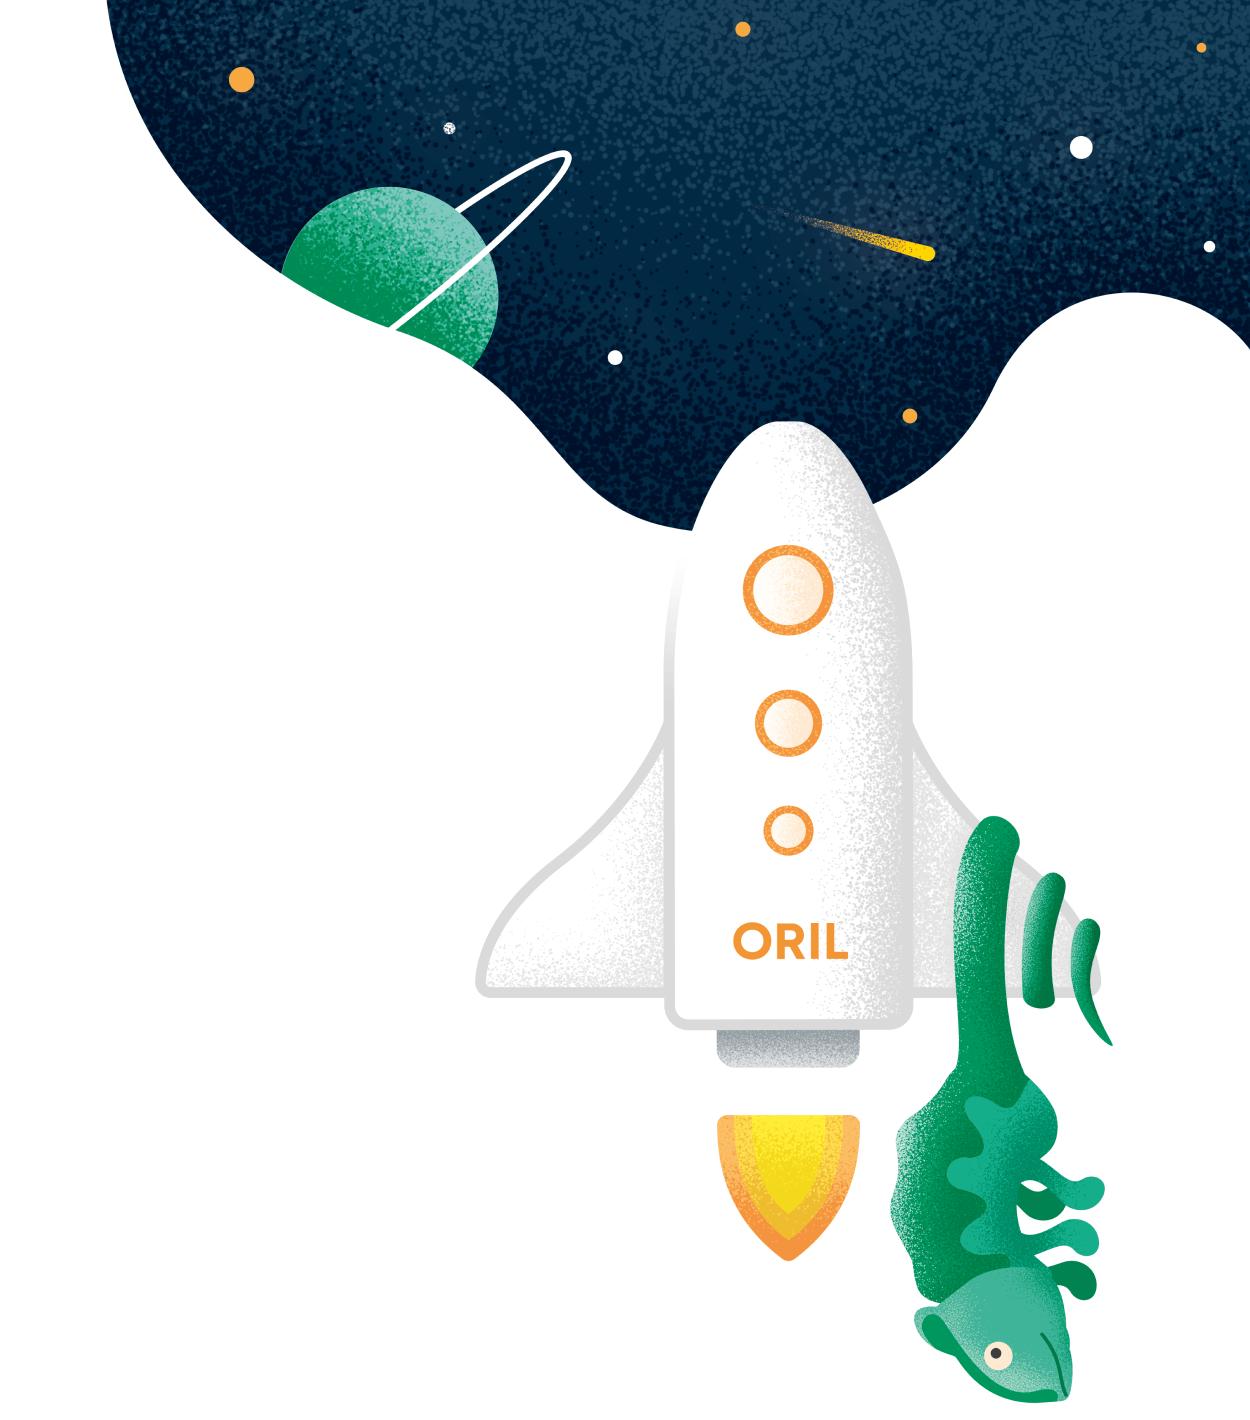 Oril rocket